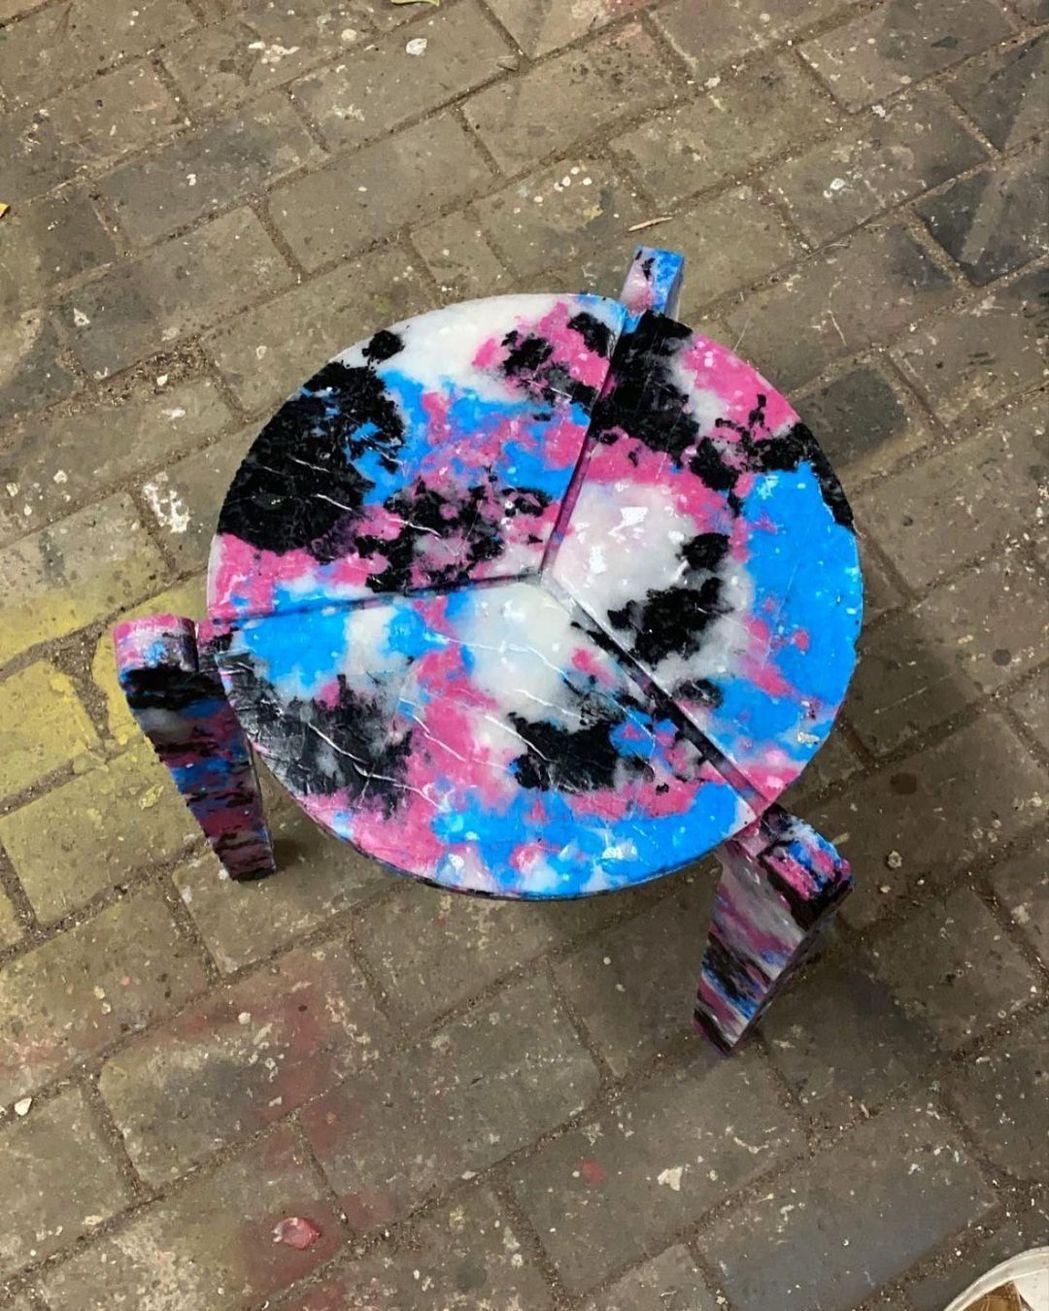 Haneul Kim創造用回收口罩製作的椅子。圖/摘自Haneul Kim IG